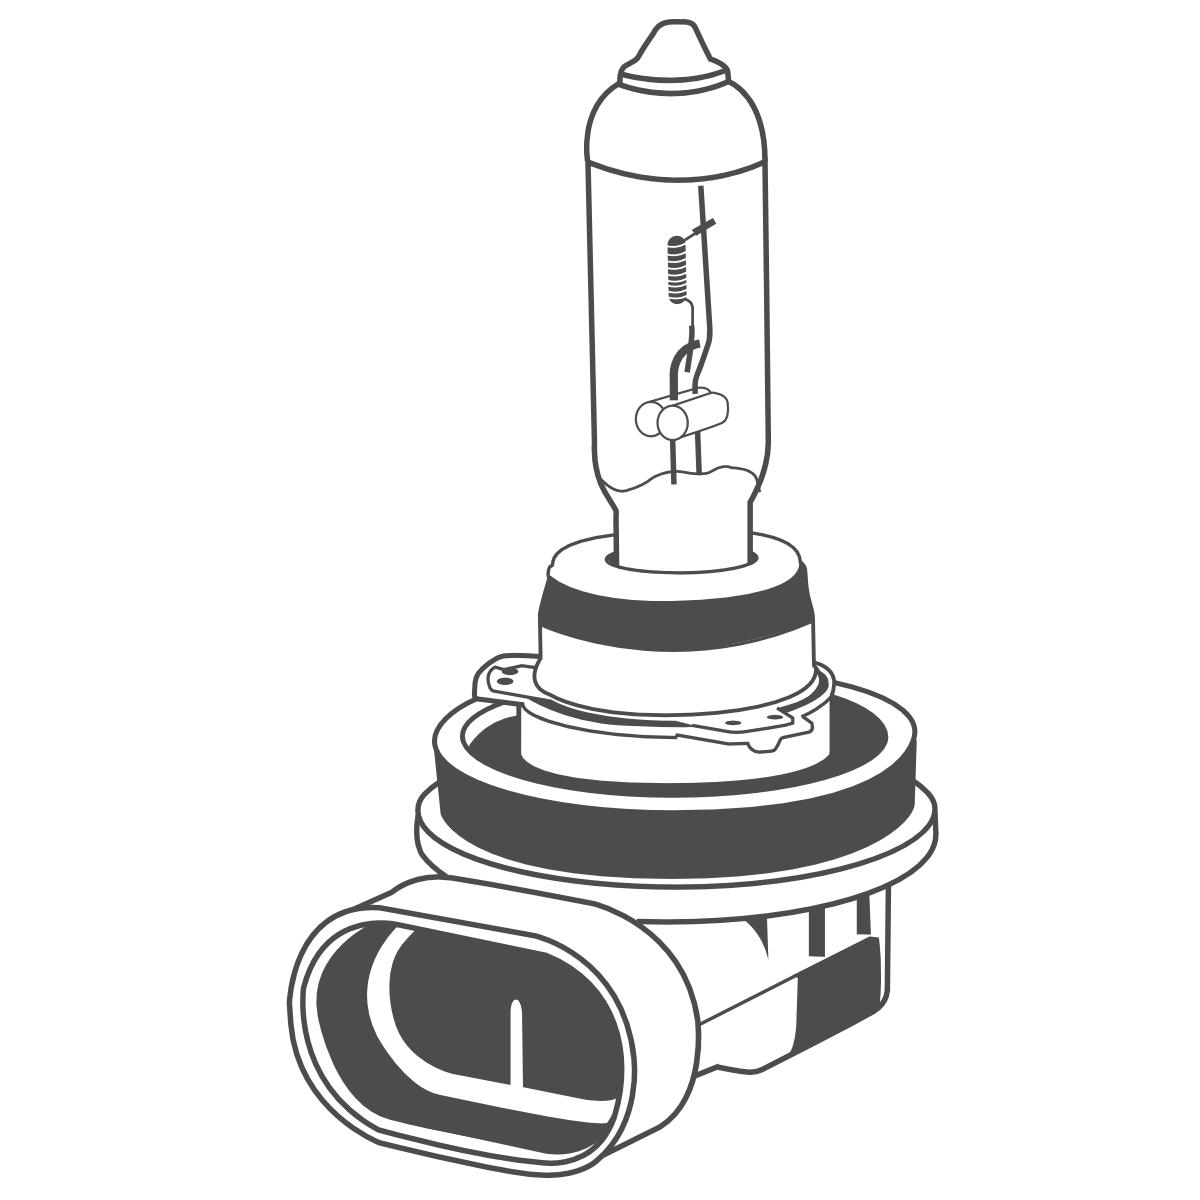 10x Brehma H11 Halogen Lamp 55w 12v Pgj19 2 Bulb Car Lamp